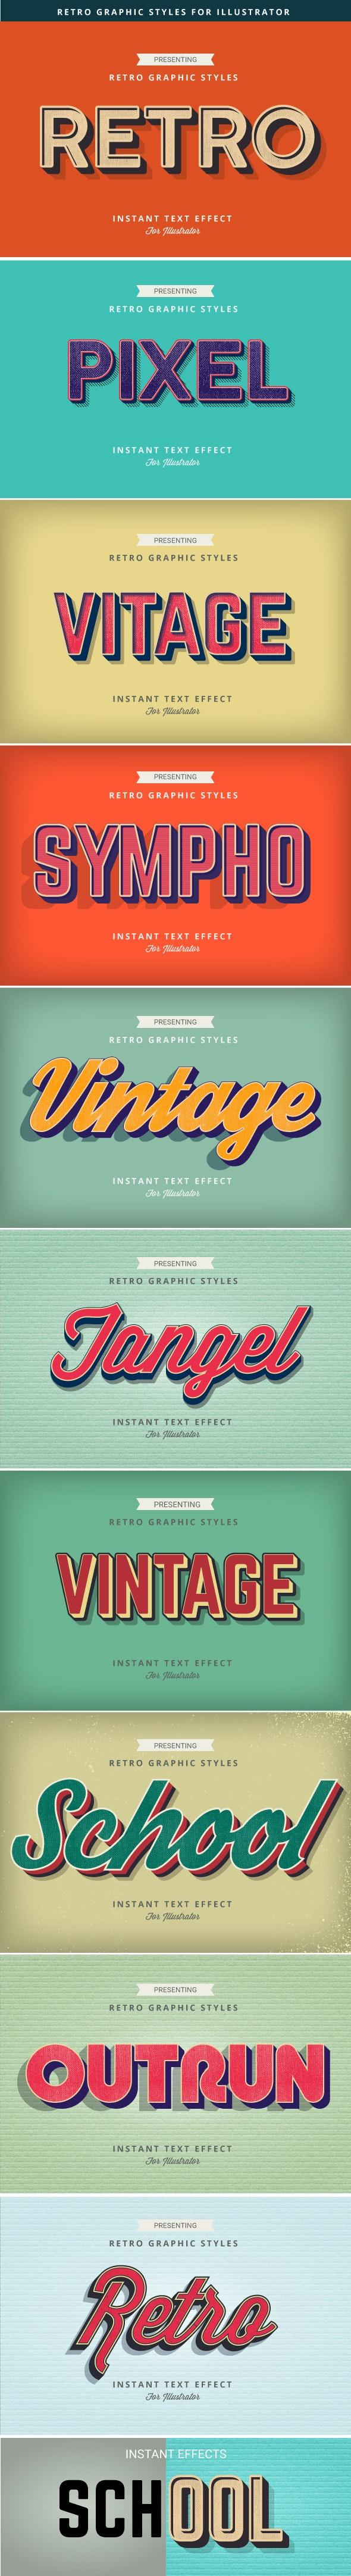 Retro Vintage Text Effects - Styles Illustrator